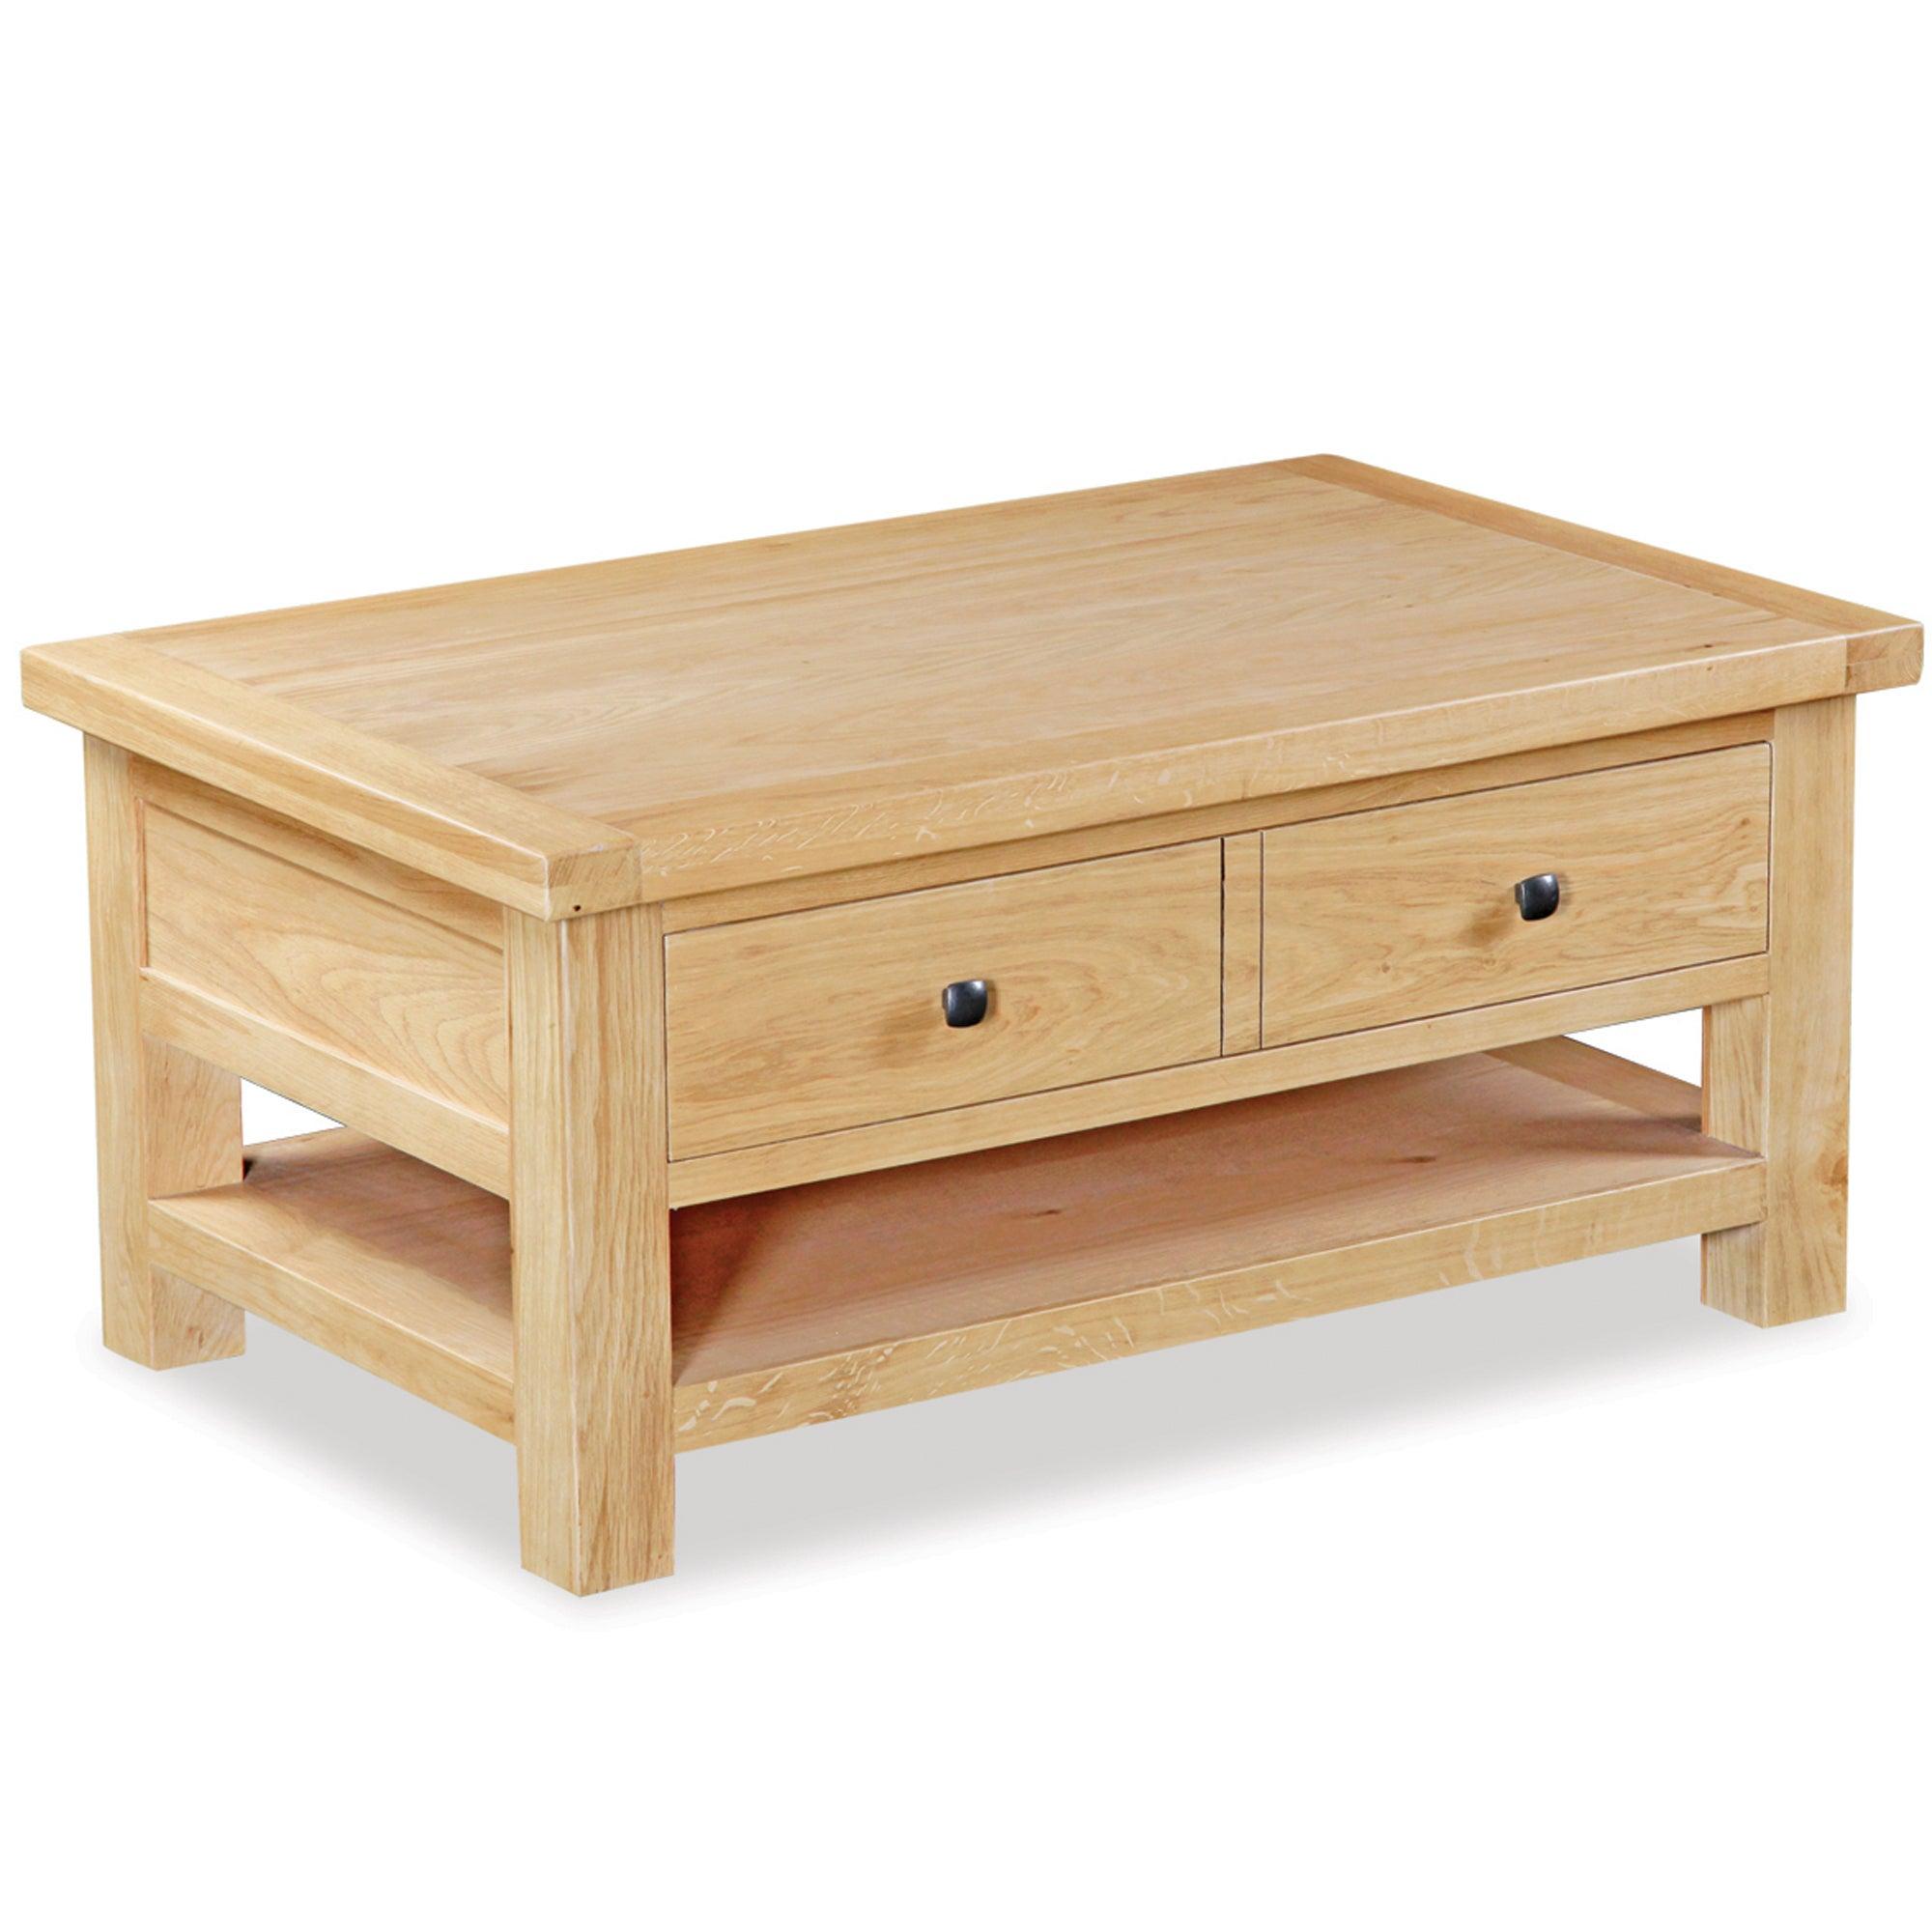 Harrogate Oak Large Coffee Table with Drawer